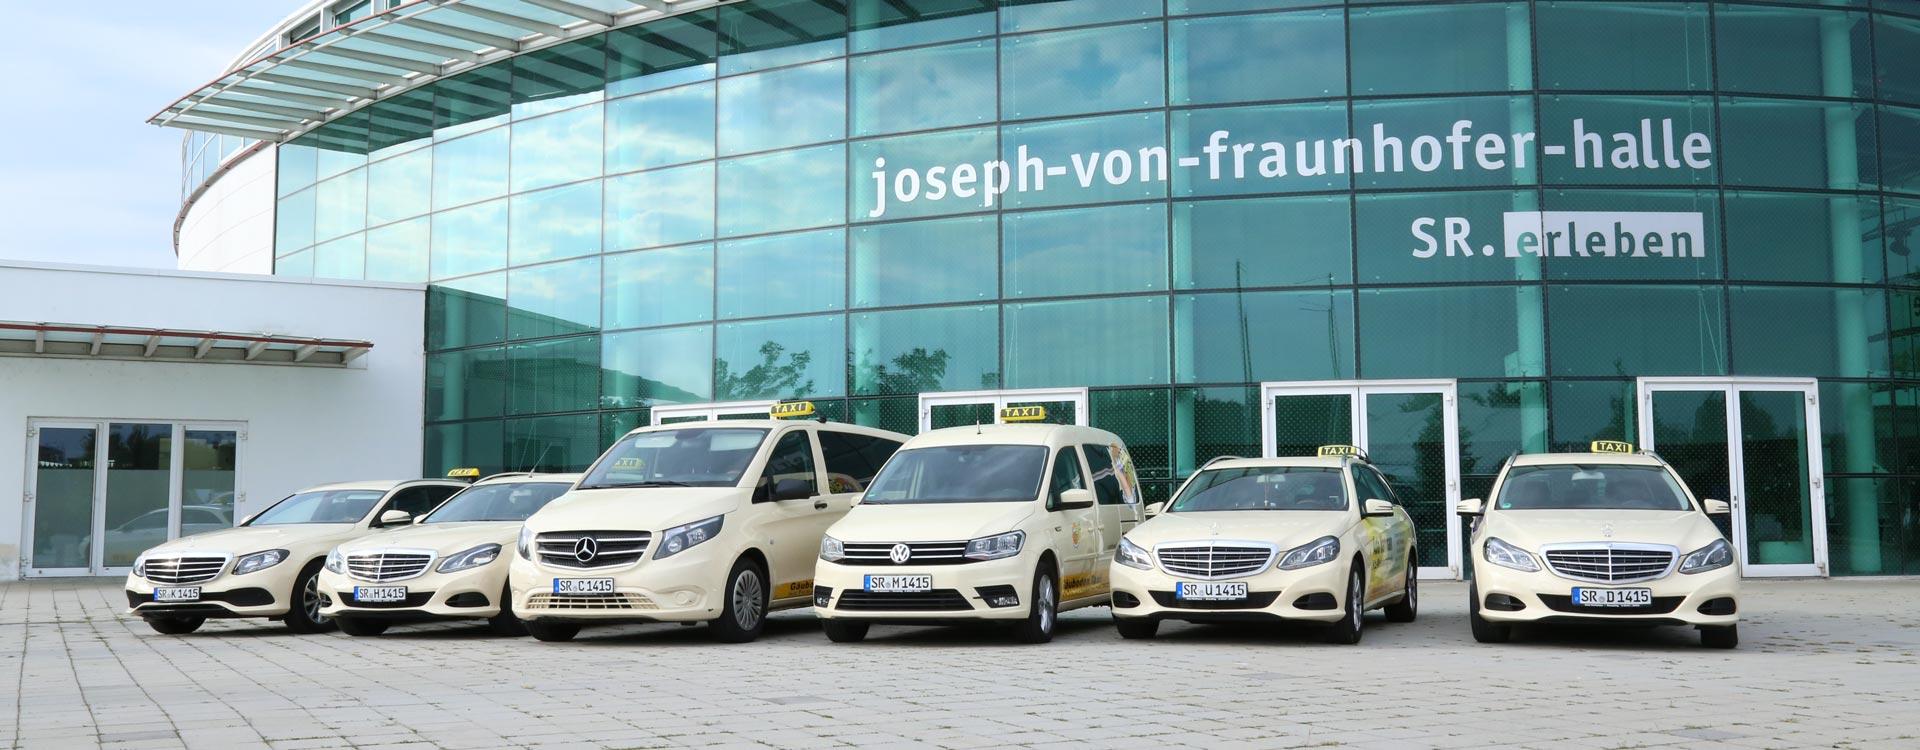 Fuhrpark mit Taxis in Straubing